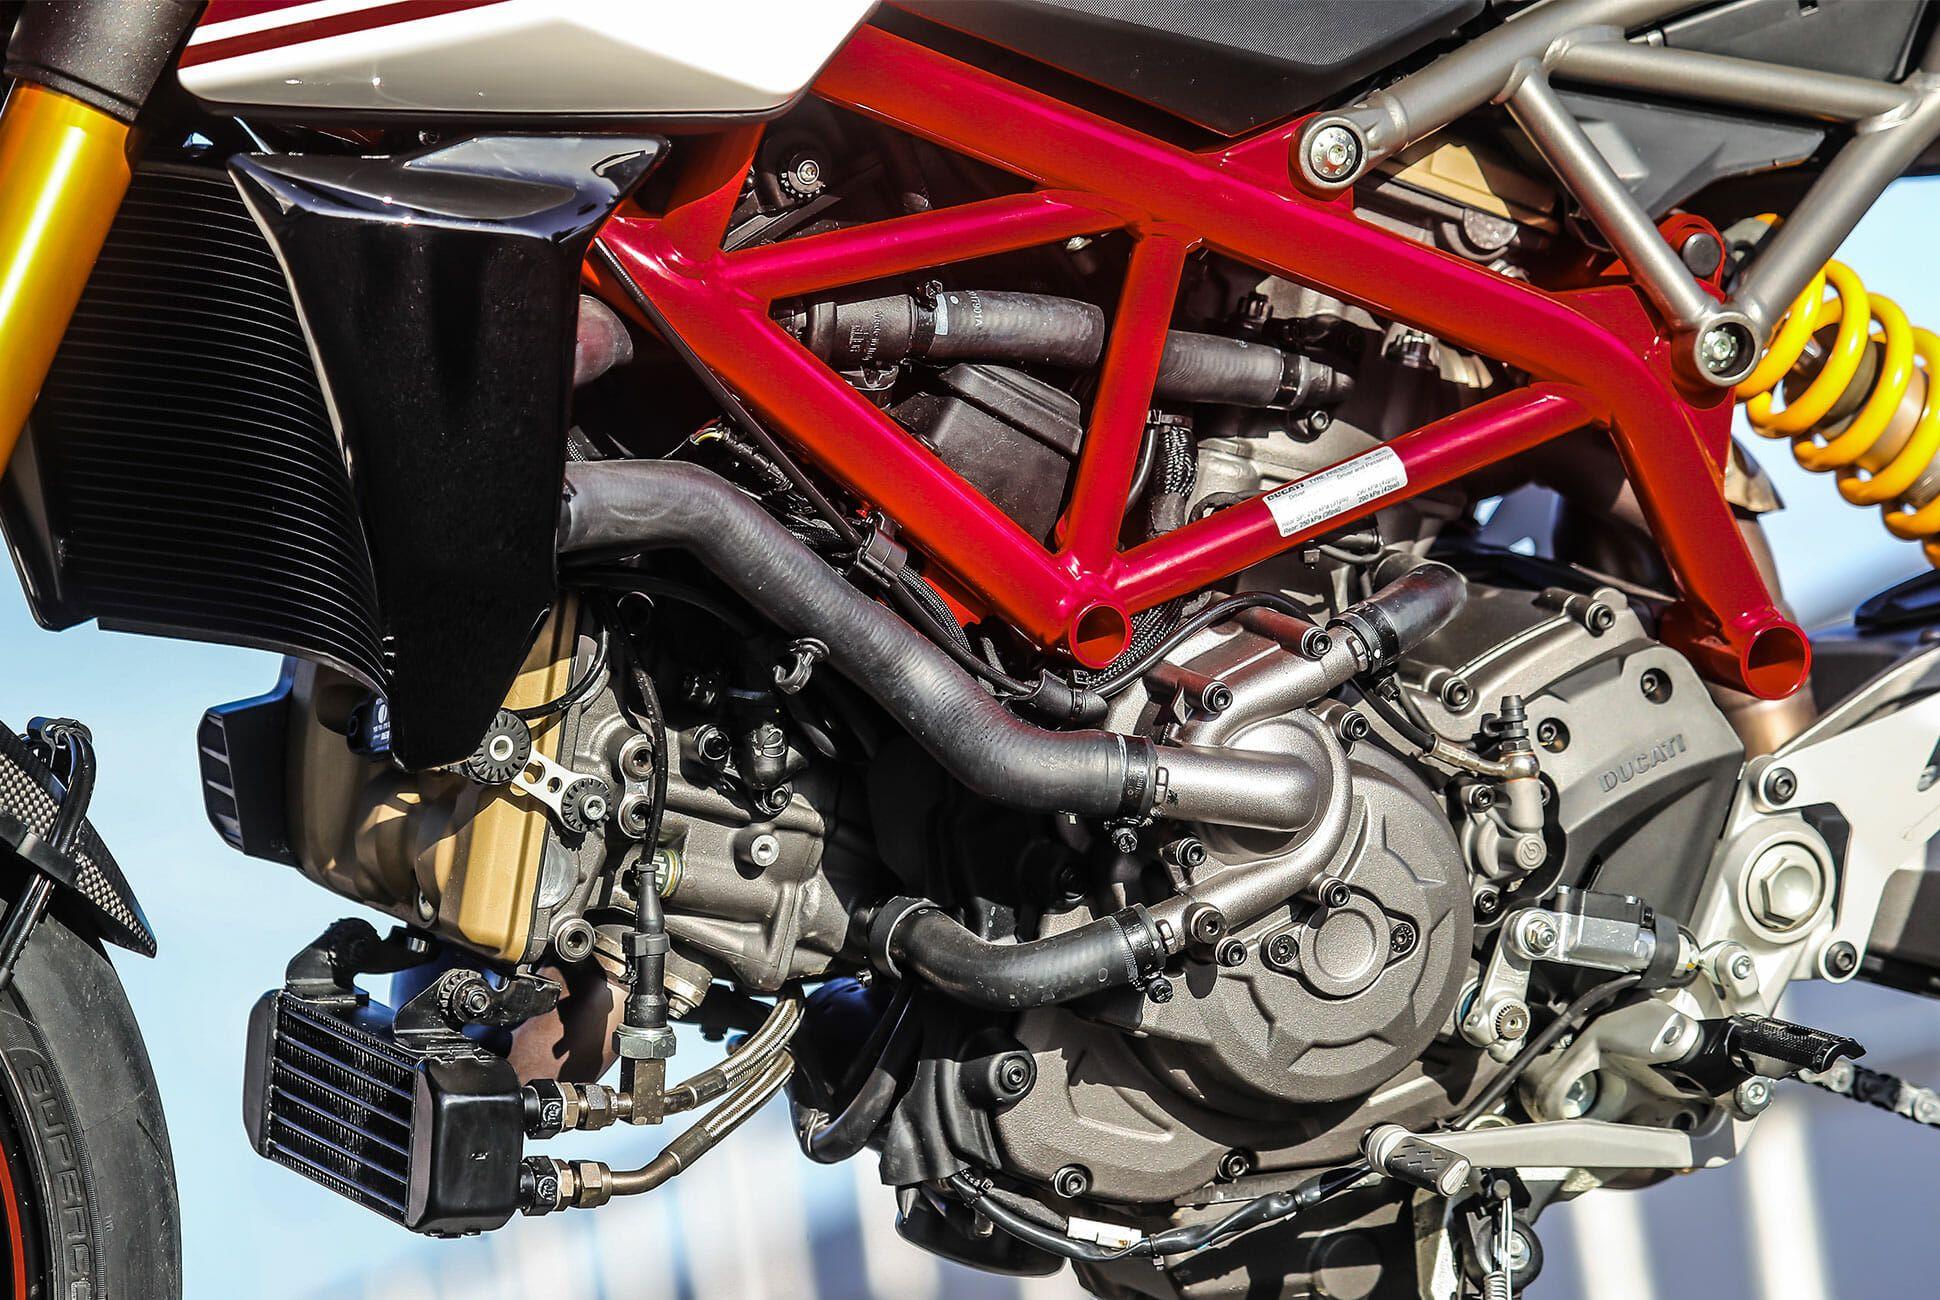 Ducati-Hypermotard-950-SP-Review-gear-patrol-slide-3